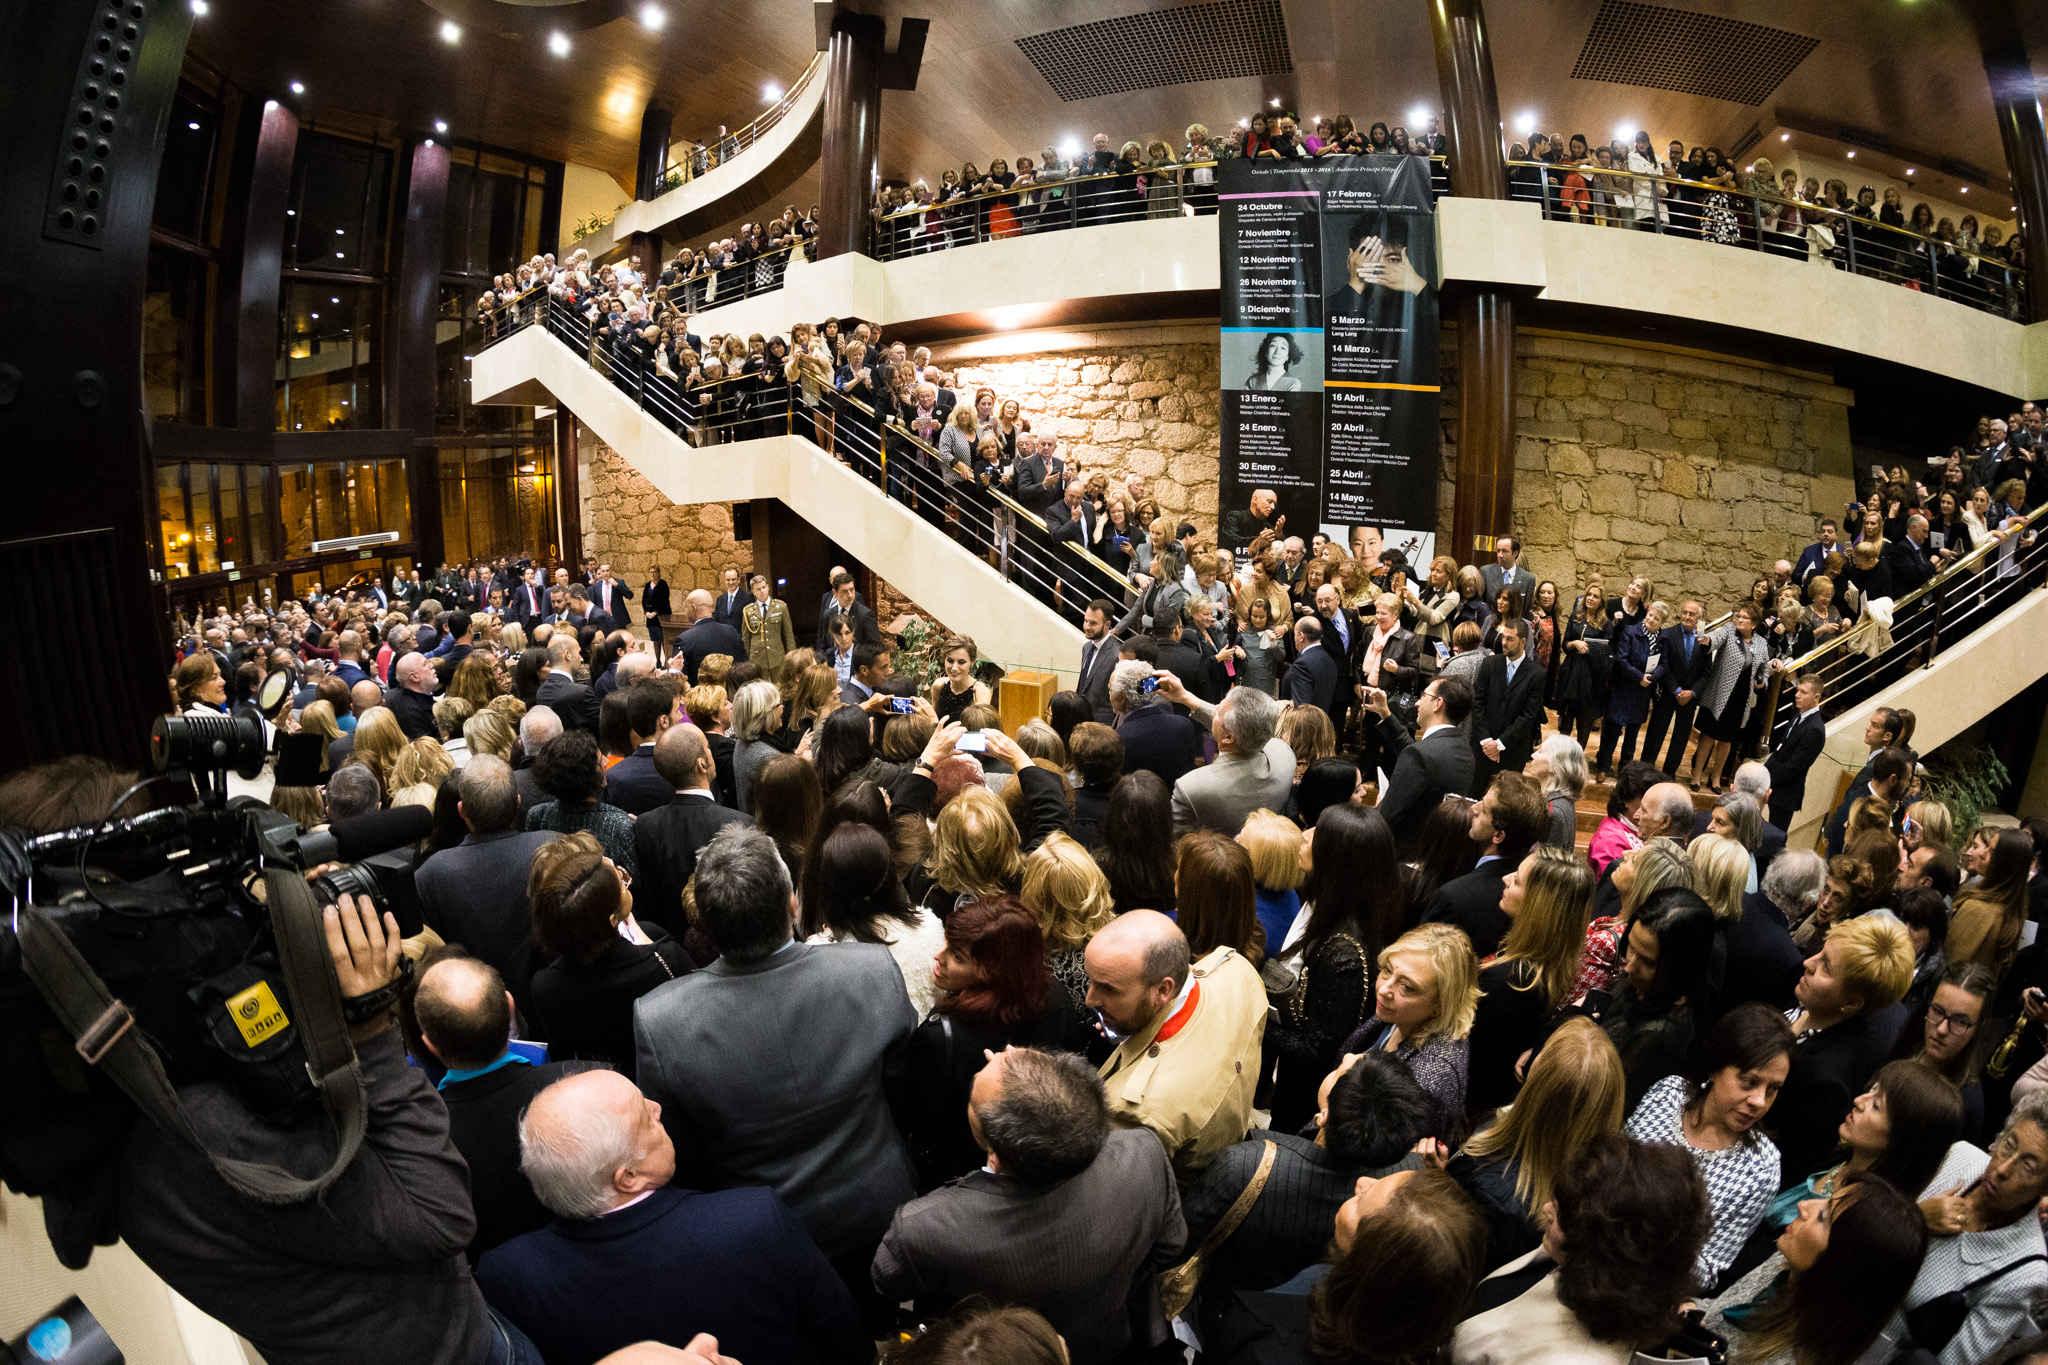 XXIV Princess of Asturias Awards Concert